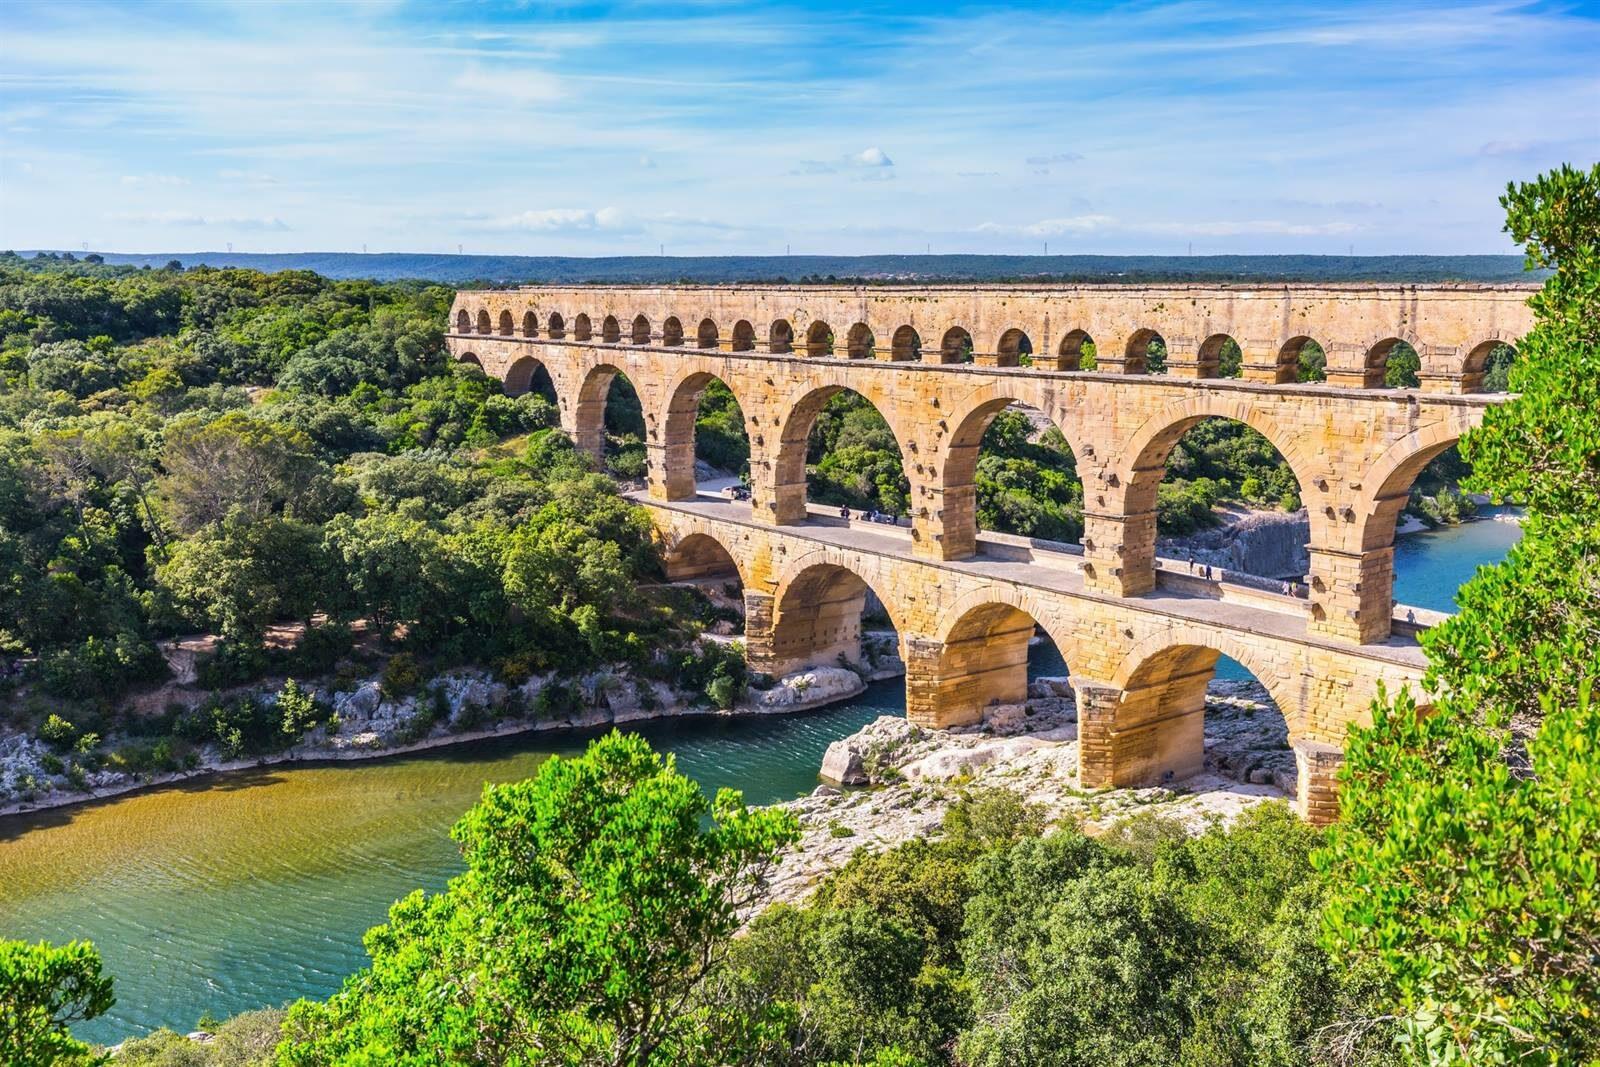 provence-pont-du-gard_4779_xl.jpg